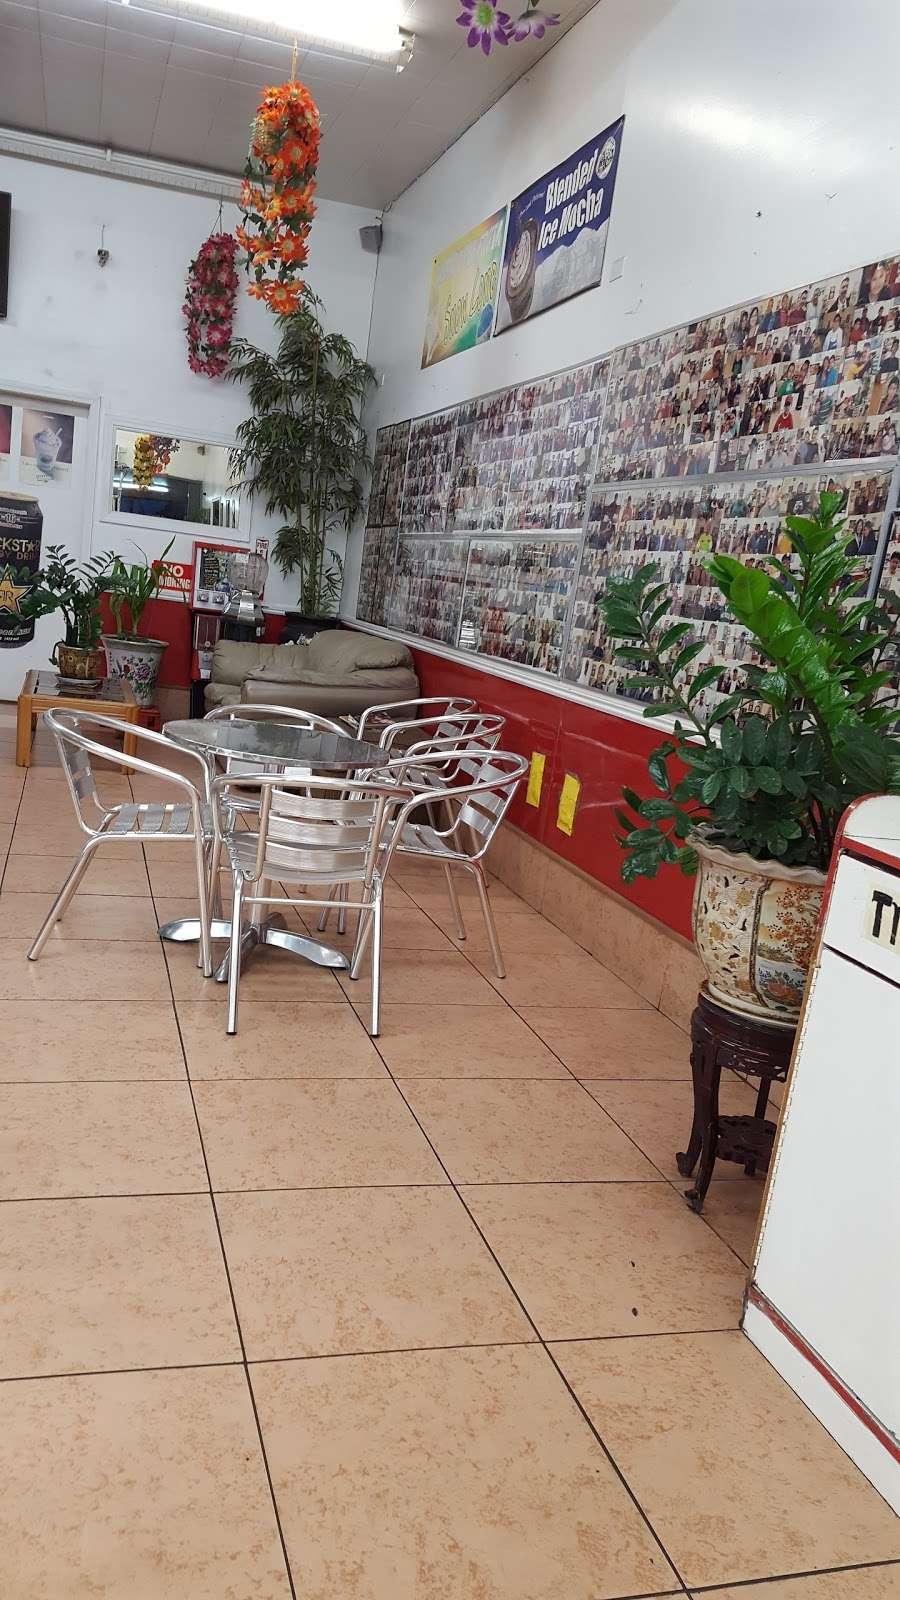 Copina Donuts - bakery  | Photo 1 of 3 | Address: 9007 Mission Boulevard, Riverside, CA 92509, USA | Phone: (951) 685-1332